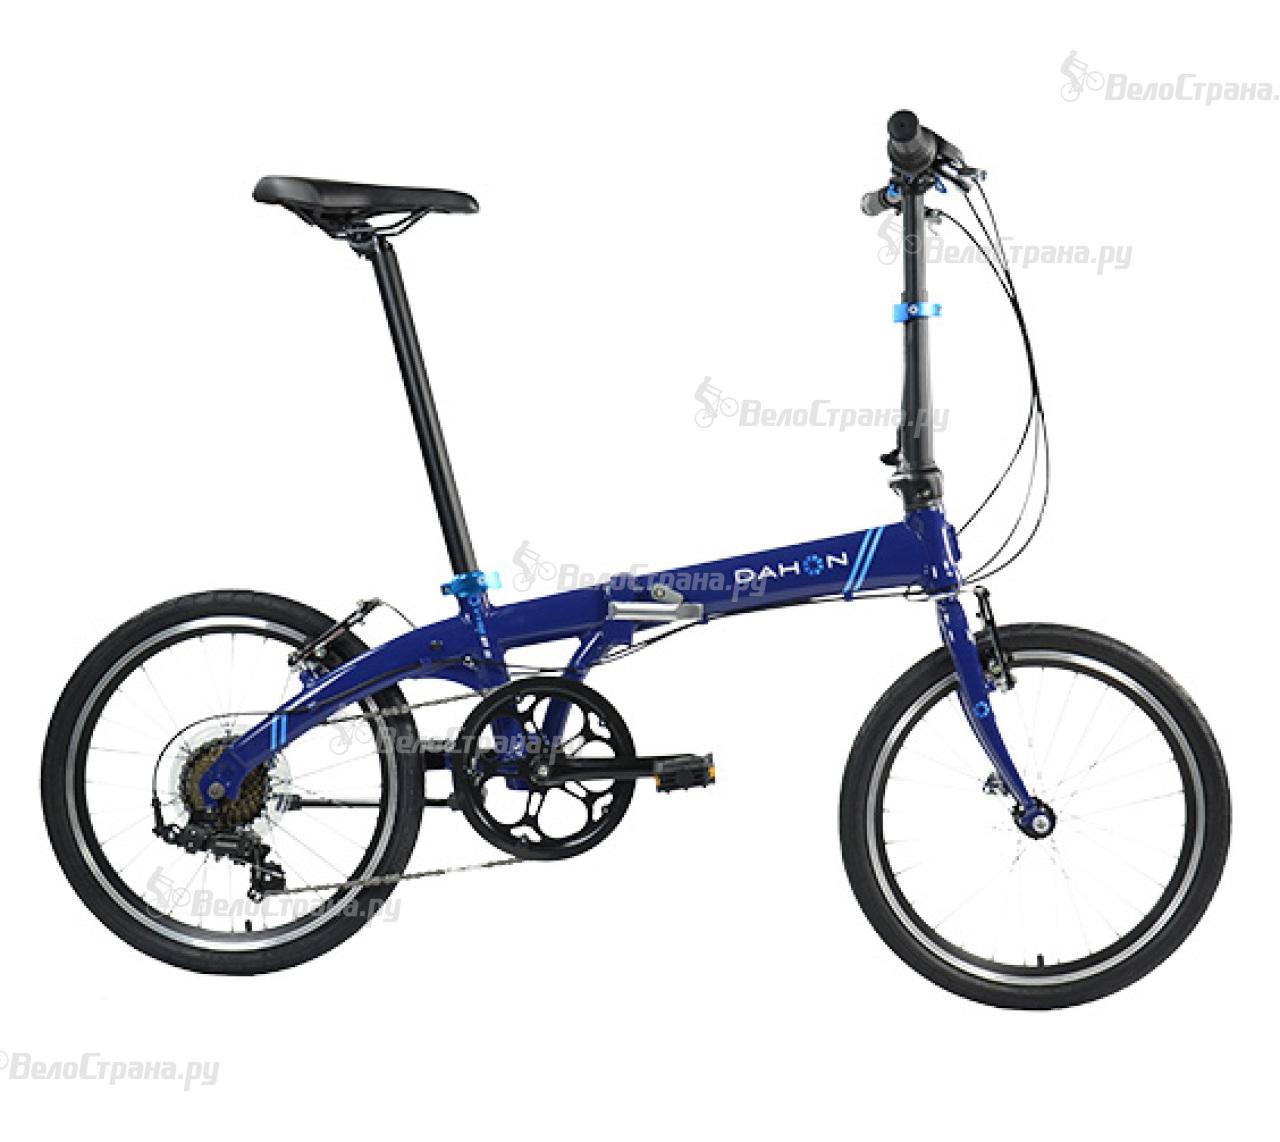 Велосипед Dahon Vybe D7 S (2017) велосипед dahon speed d7 2014